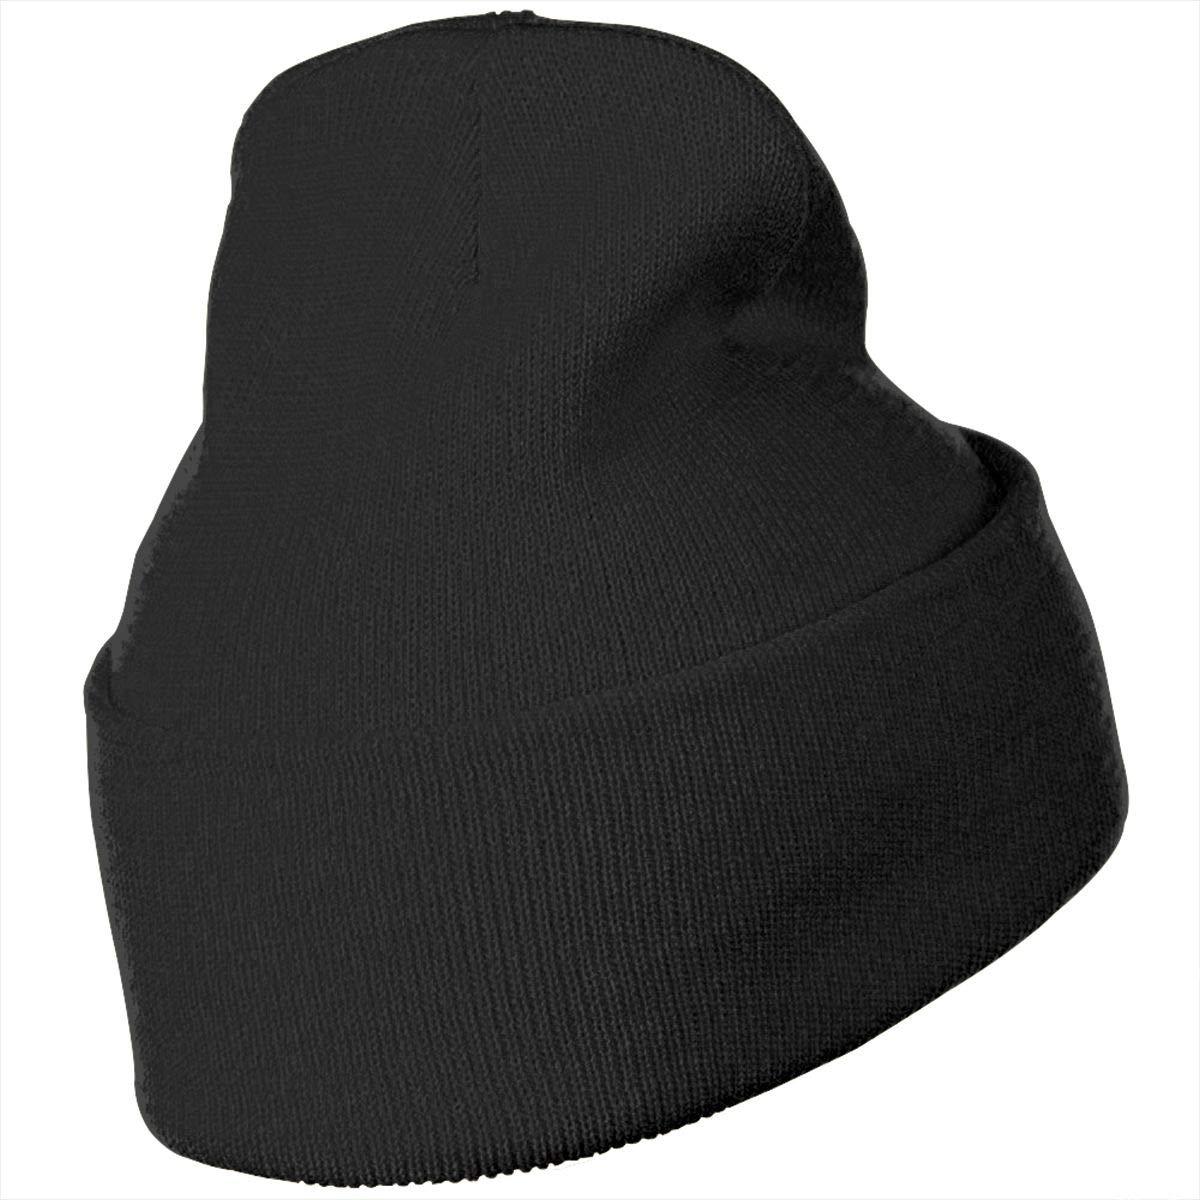 Yubb7E Fun Pattern Warm Knit Winter Solid Beanie Hat Unisex Skull Cap